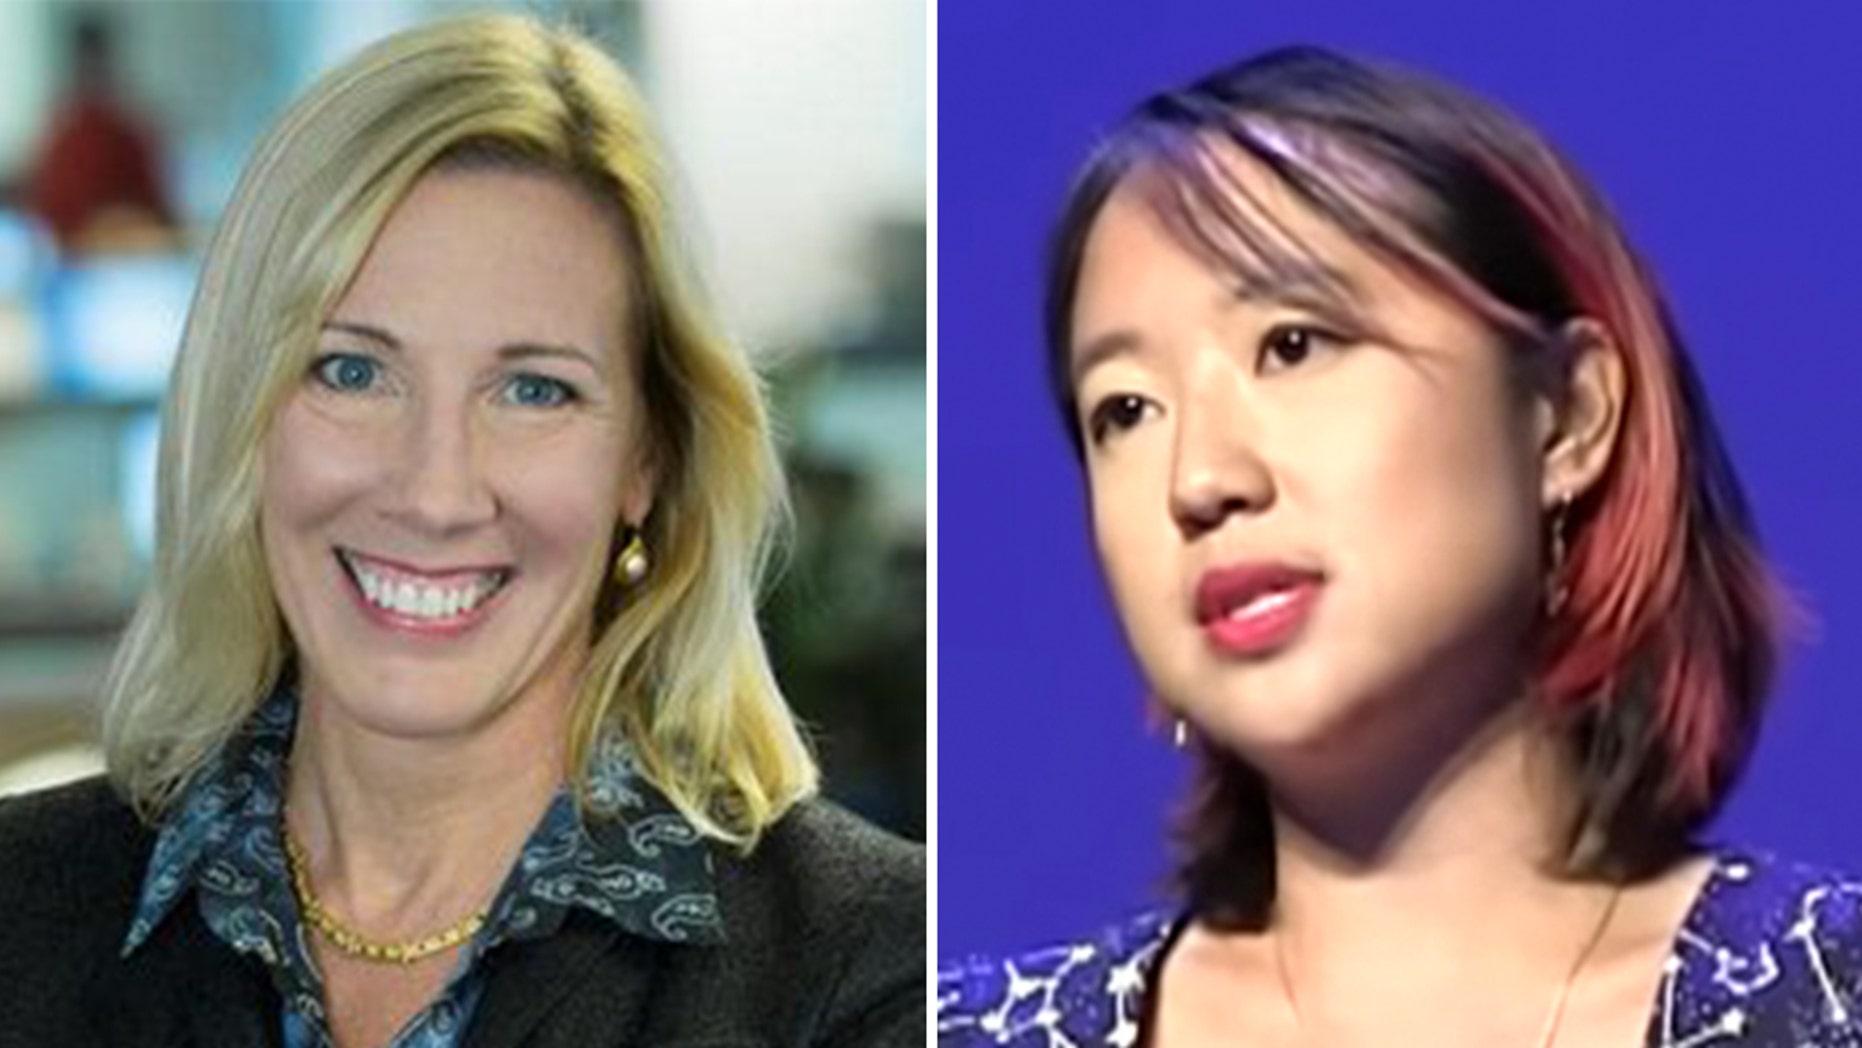 New York Times writers Elizabeth Williamson and Sarah Jeong